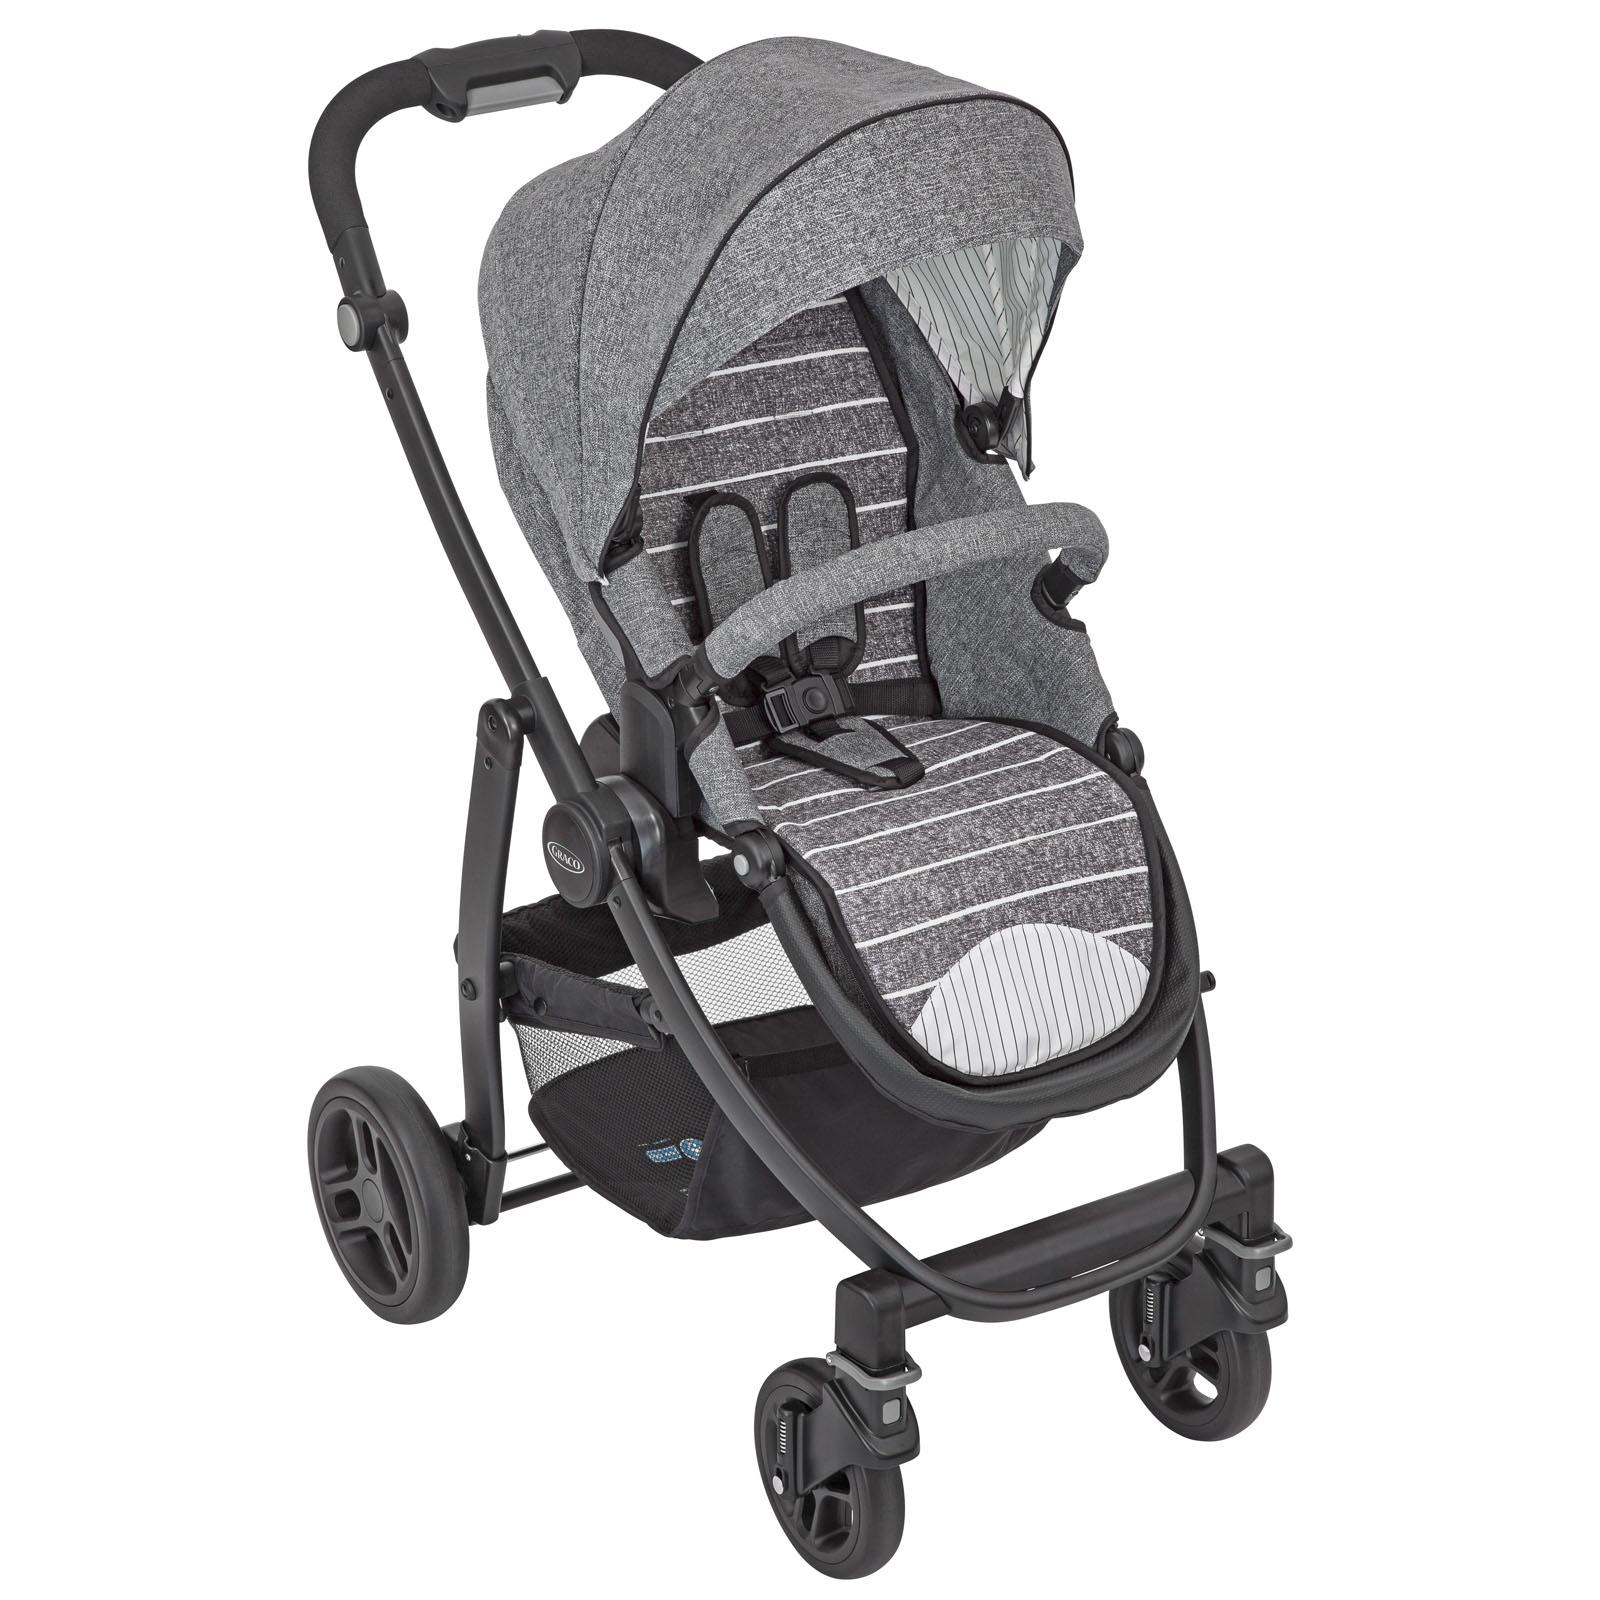 Graco Evo (SnugEssentials Car Seat) Everything You Need ...